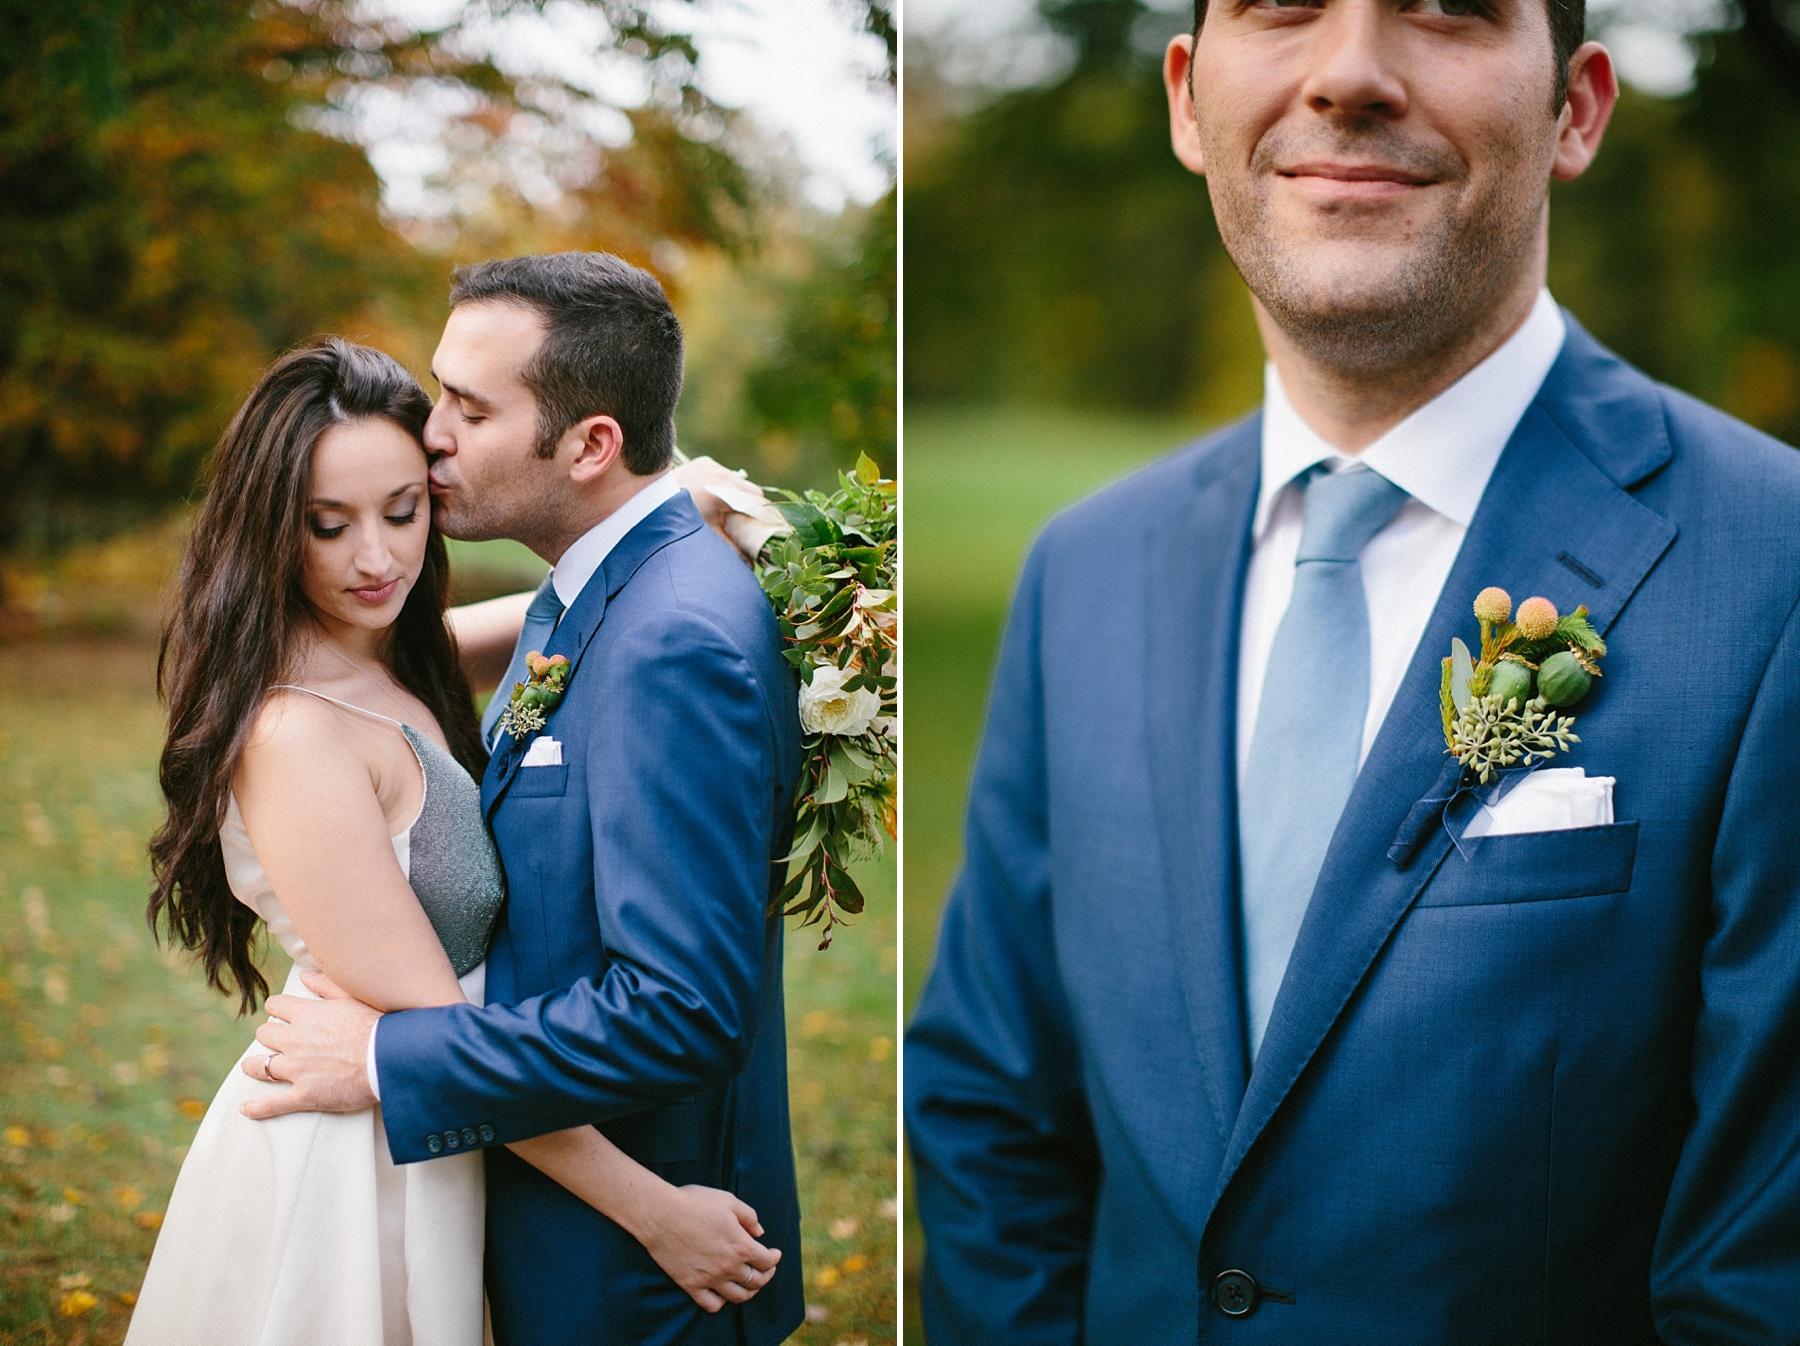 intimate-destination-wedding-photographer-outdoor_0112.jpg